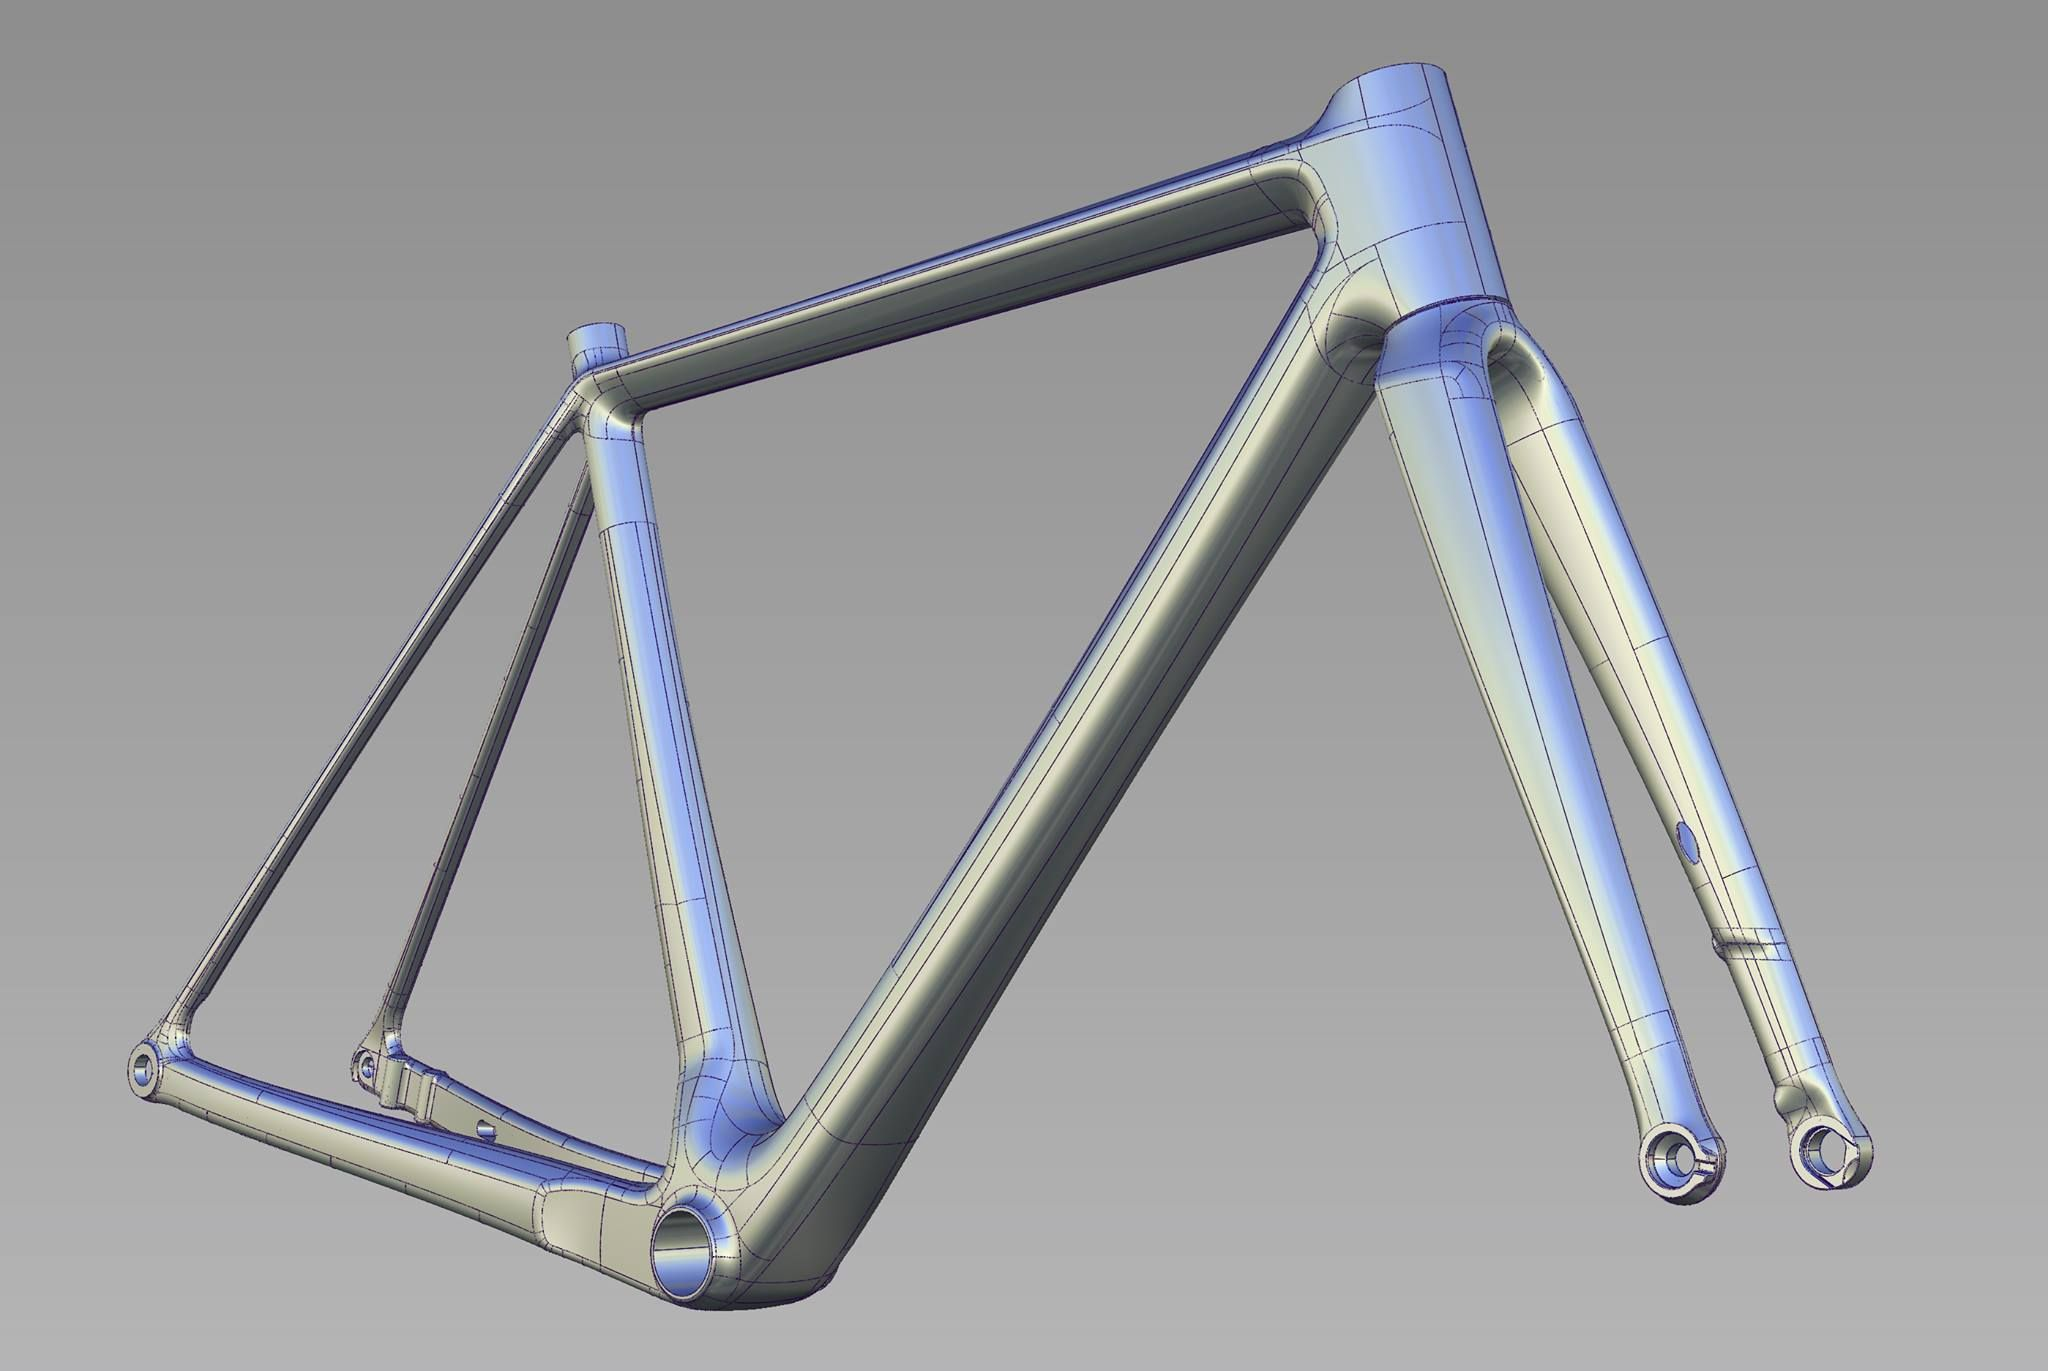 Bicycle Model Bike Frame Technical Illustration Bicycle Frame